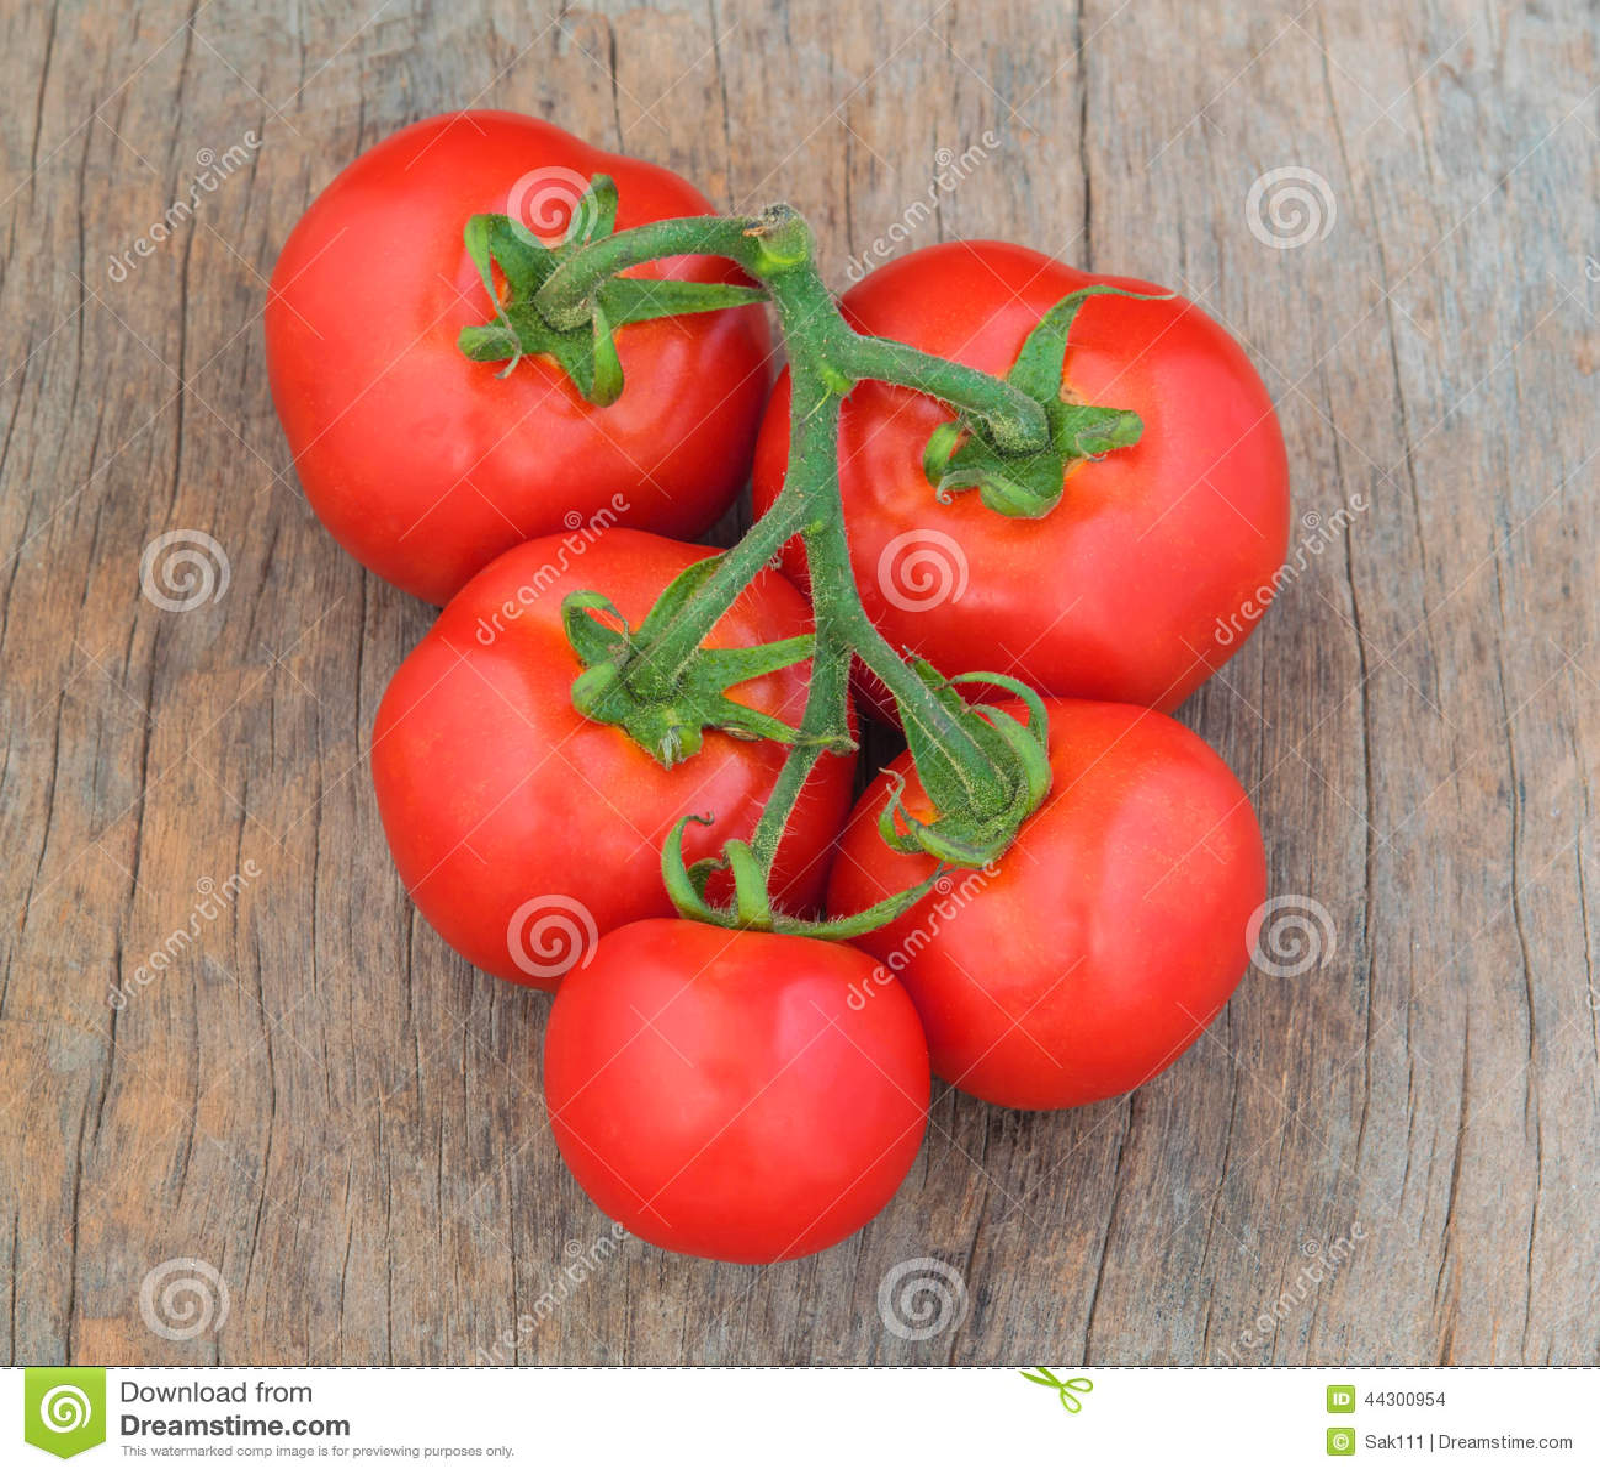 Tomato on wood background stock photography